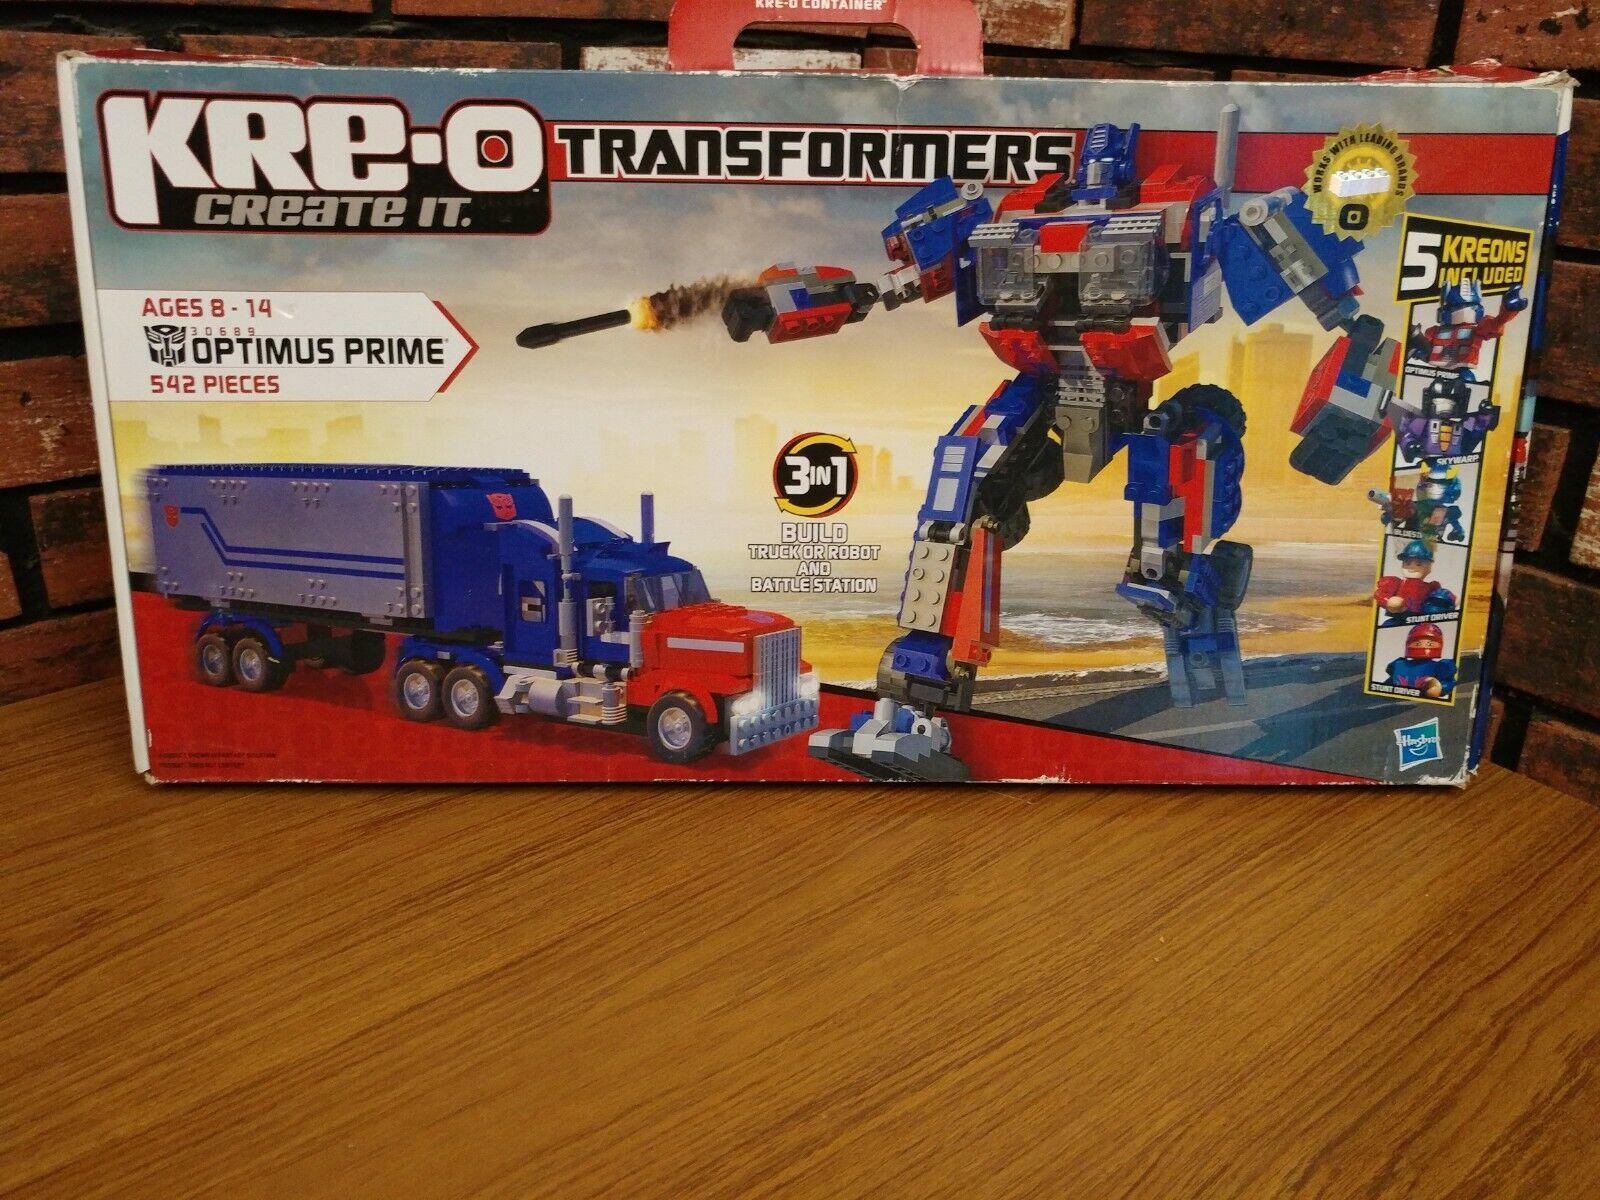 KRE-O TRANSFORMERS 30689 OPTIMUS PRIME NEW IN BOX SEALED